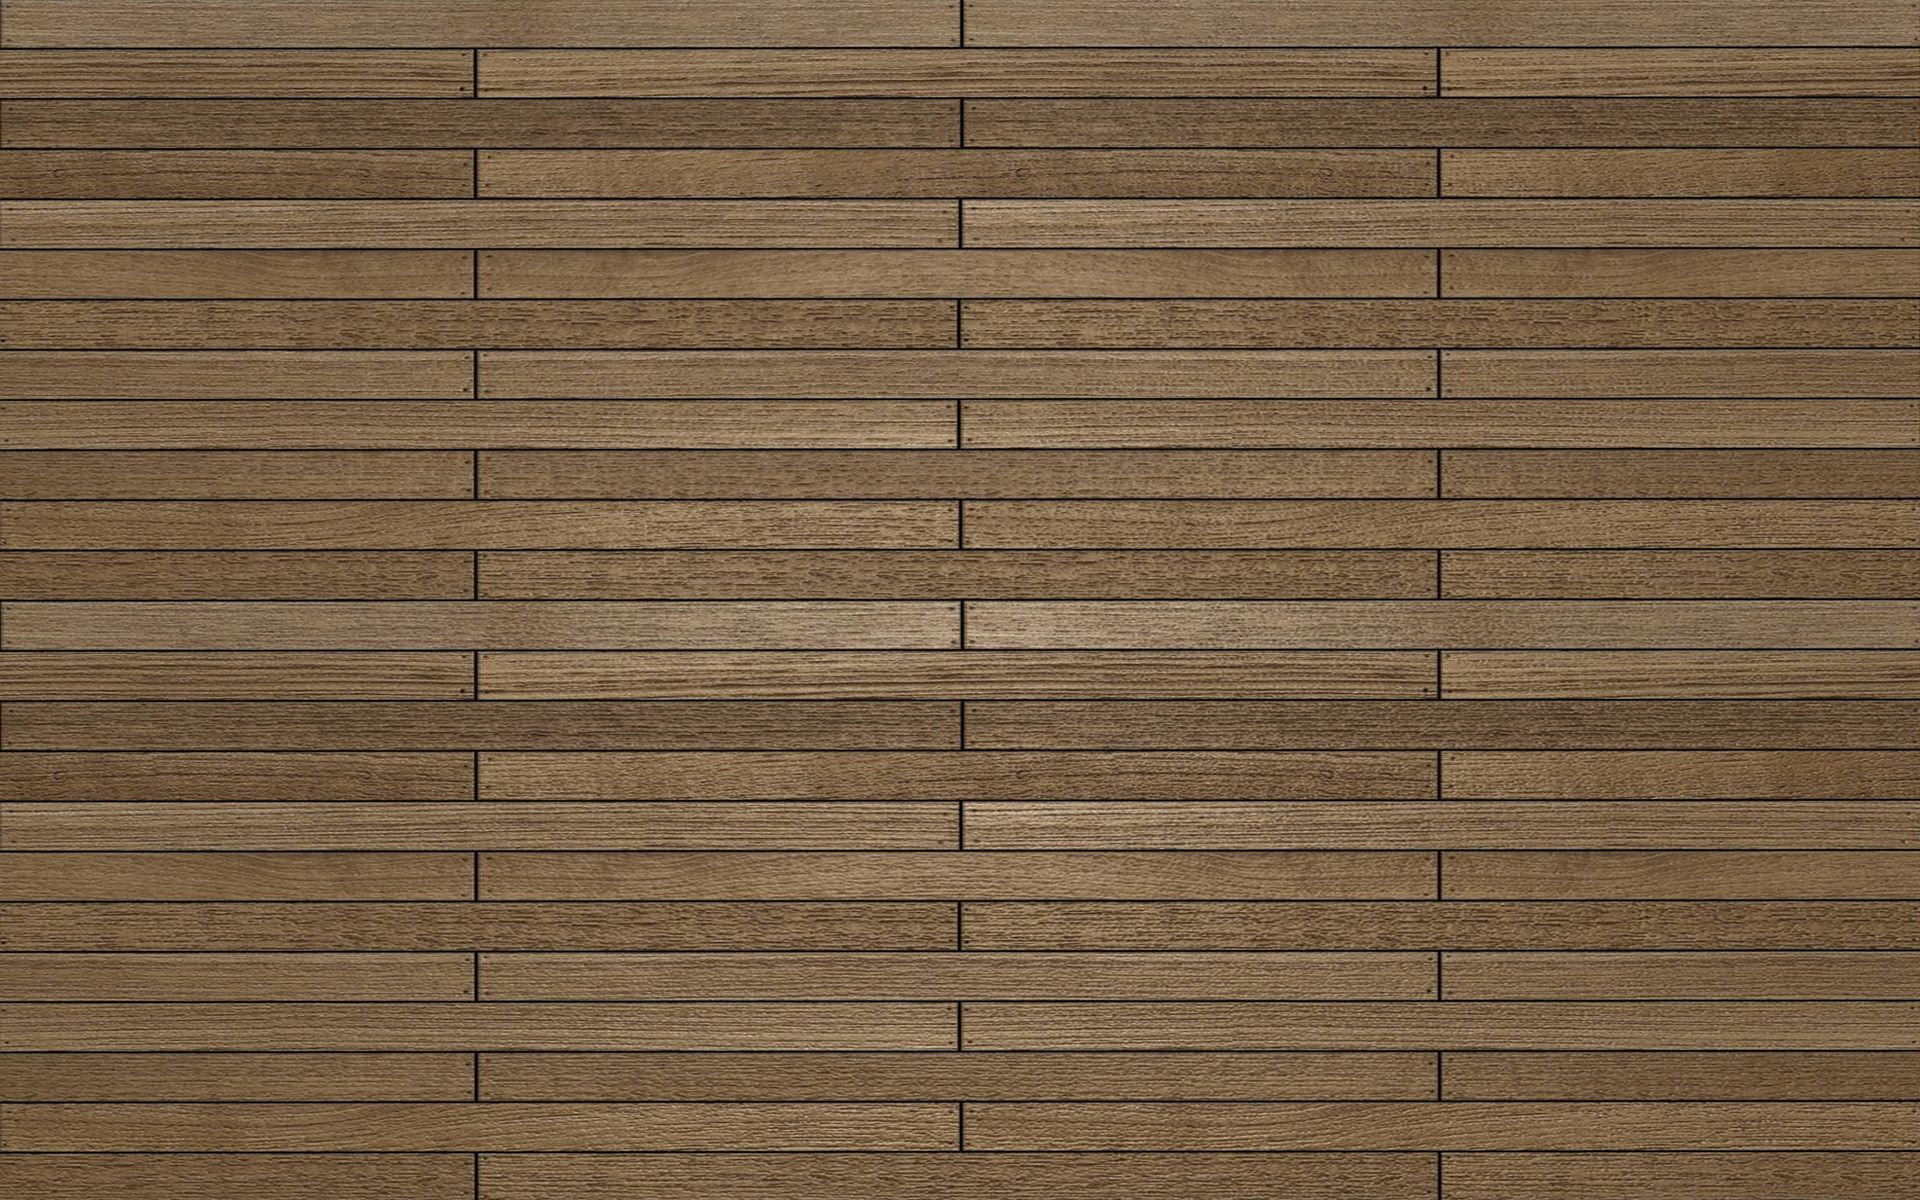 Wood Flooring Background Awesome 31006 Ripado, Blocos de